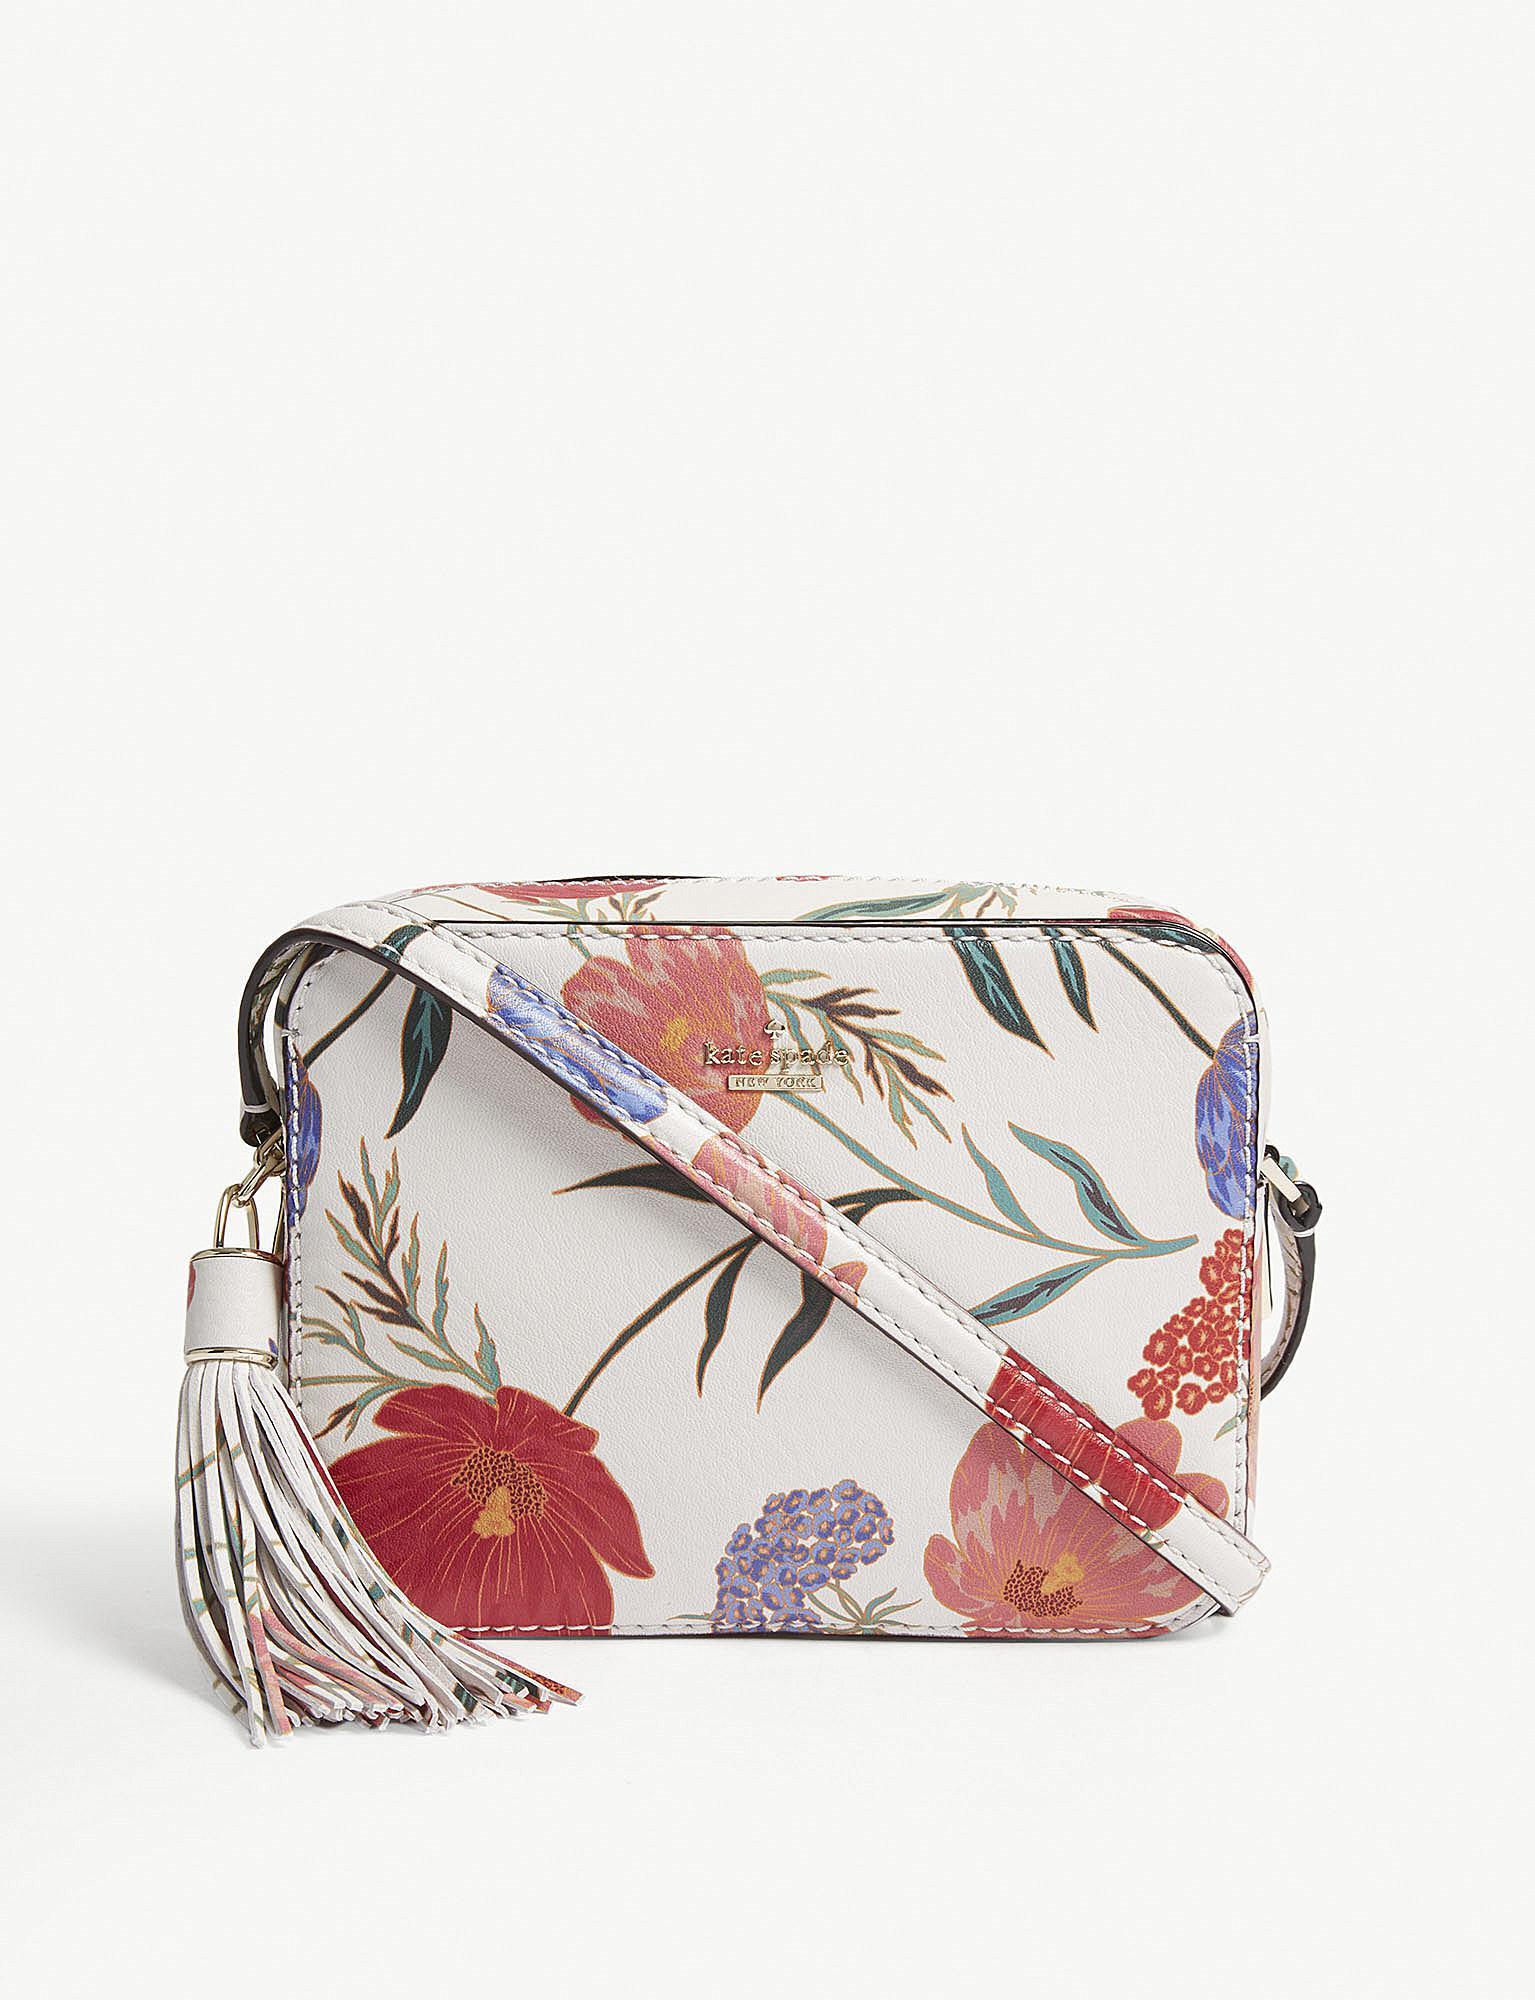 68b86b62bc3c Kate Spade - Multicolor Kingston Drive Arla Floral Leather Cross-body Bag -  Lyst